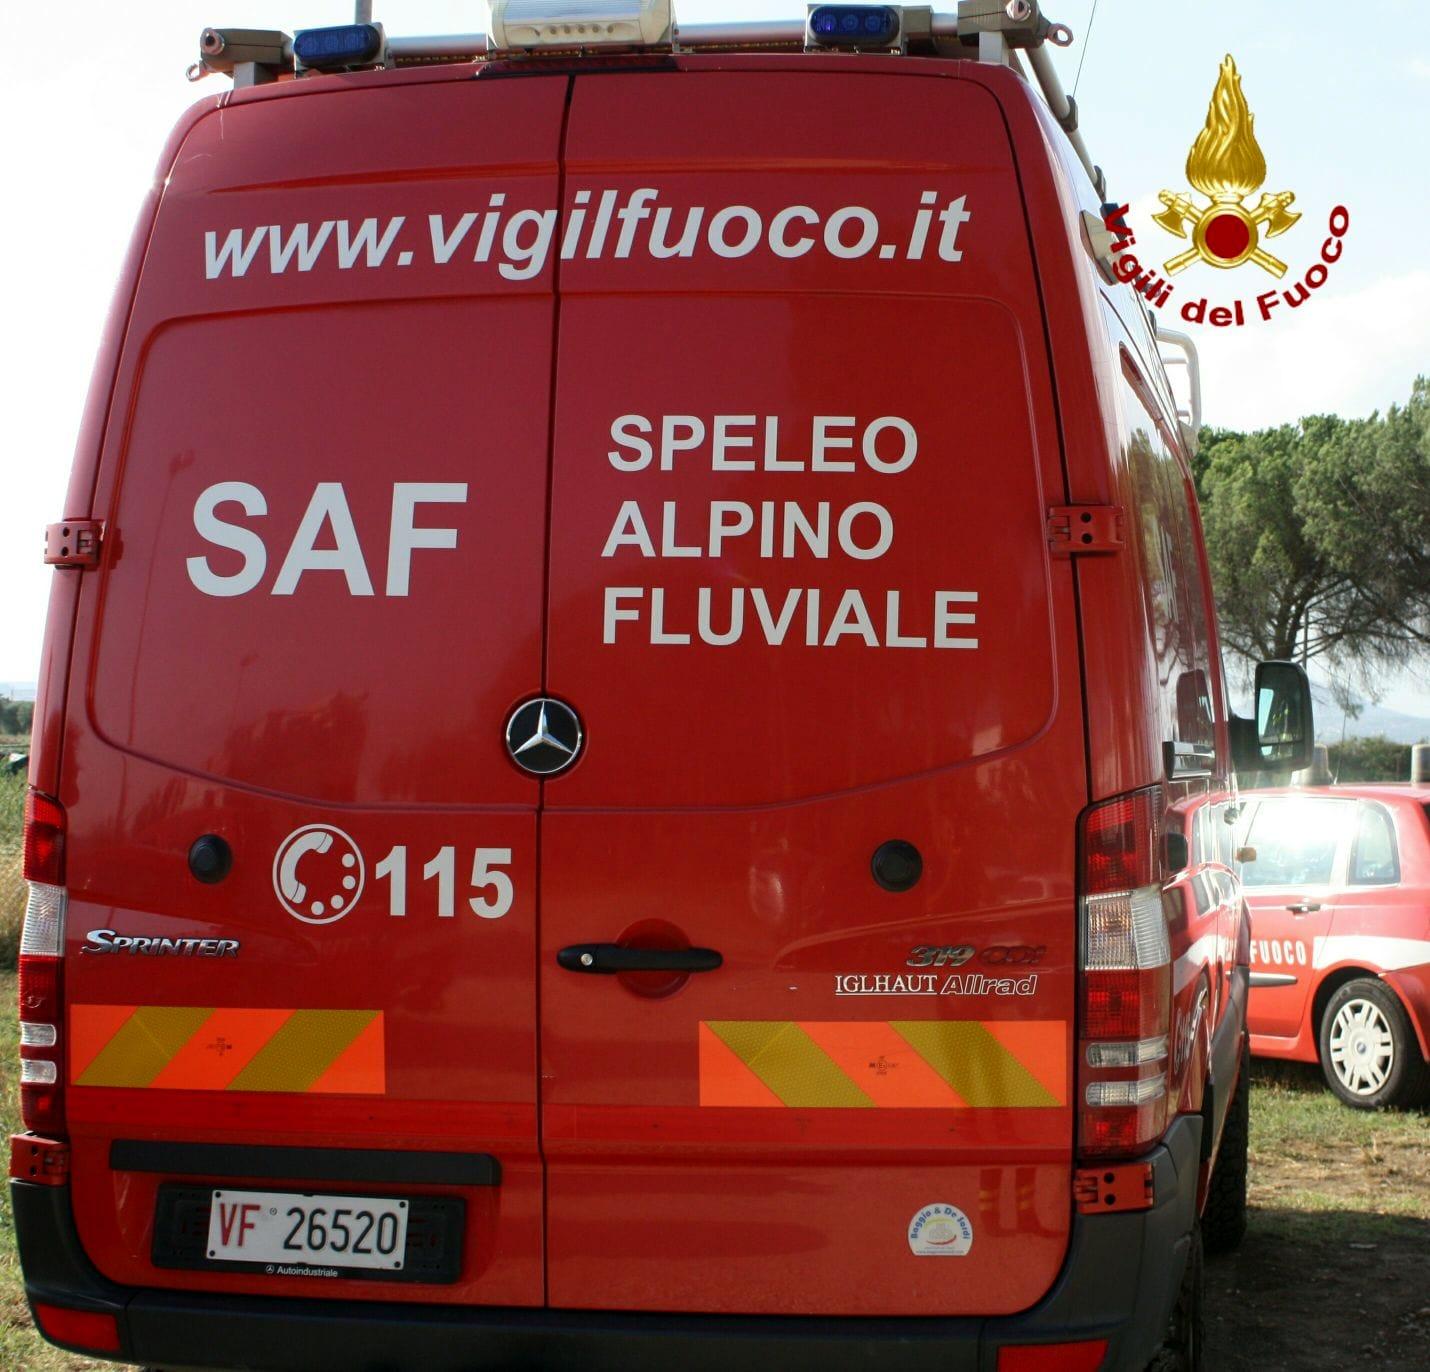 Saf Vigili fuoco-3